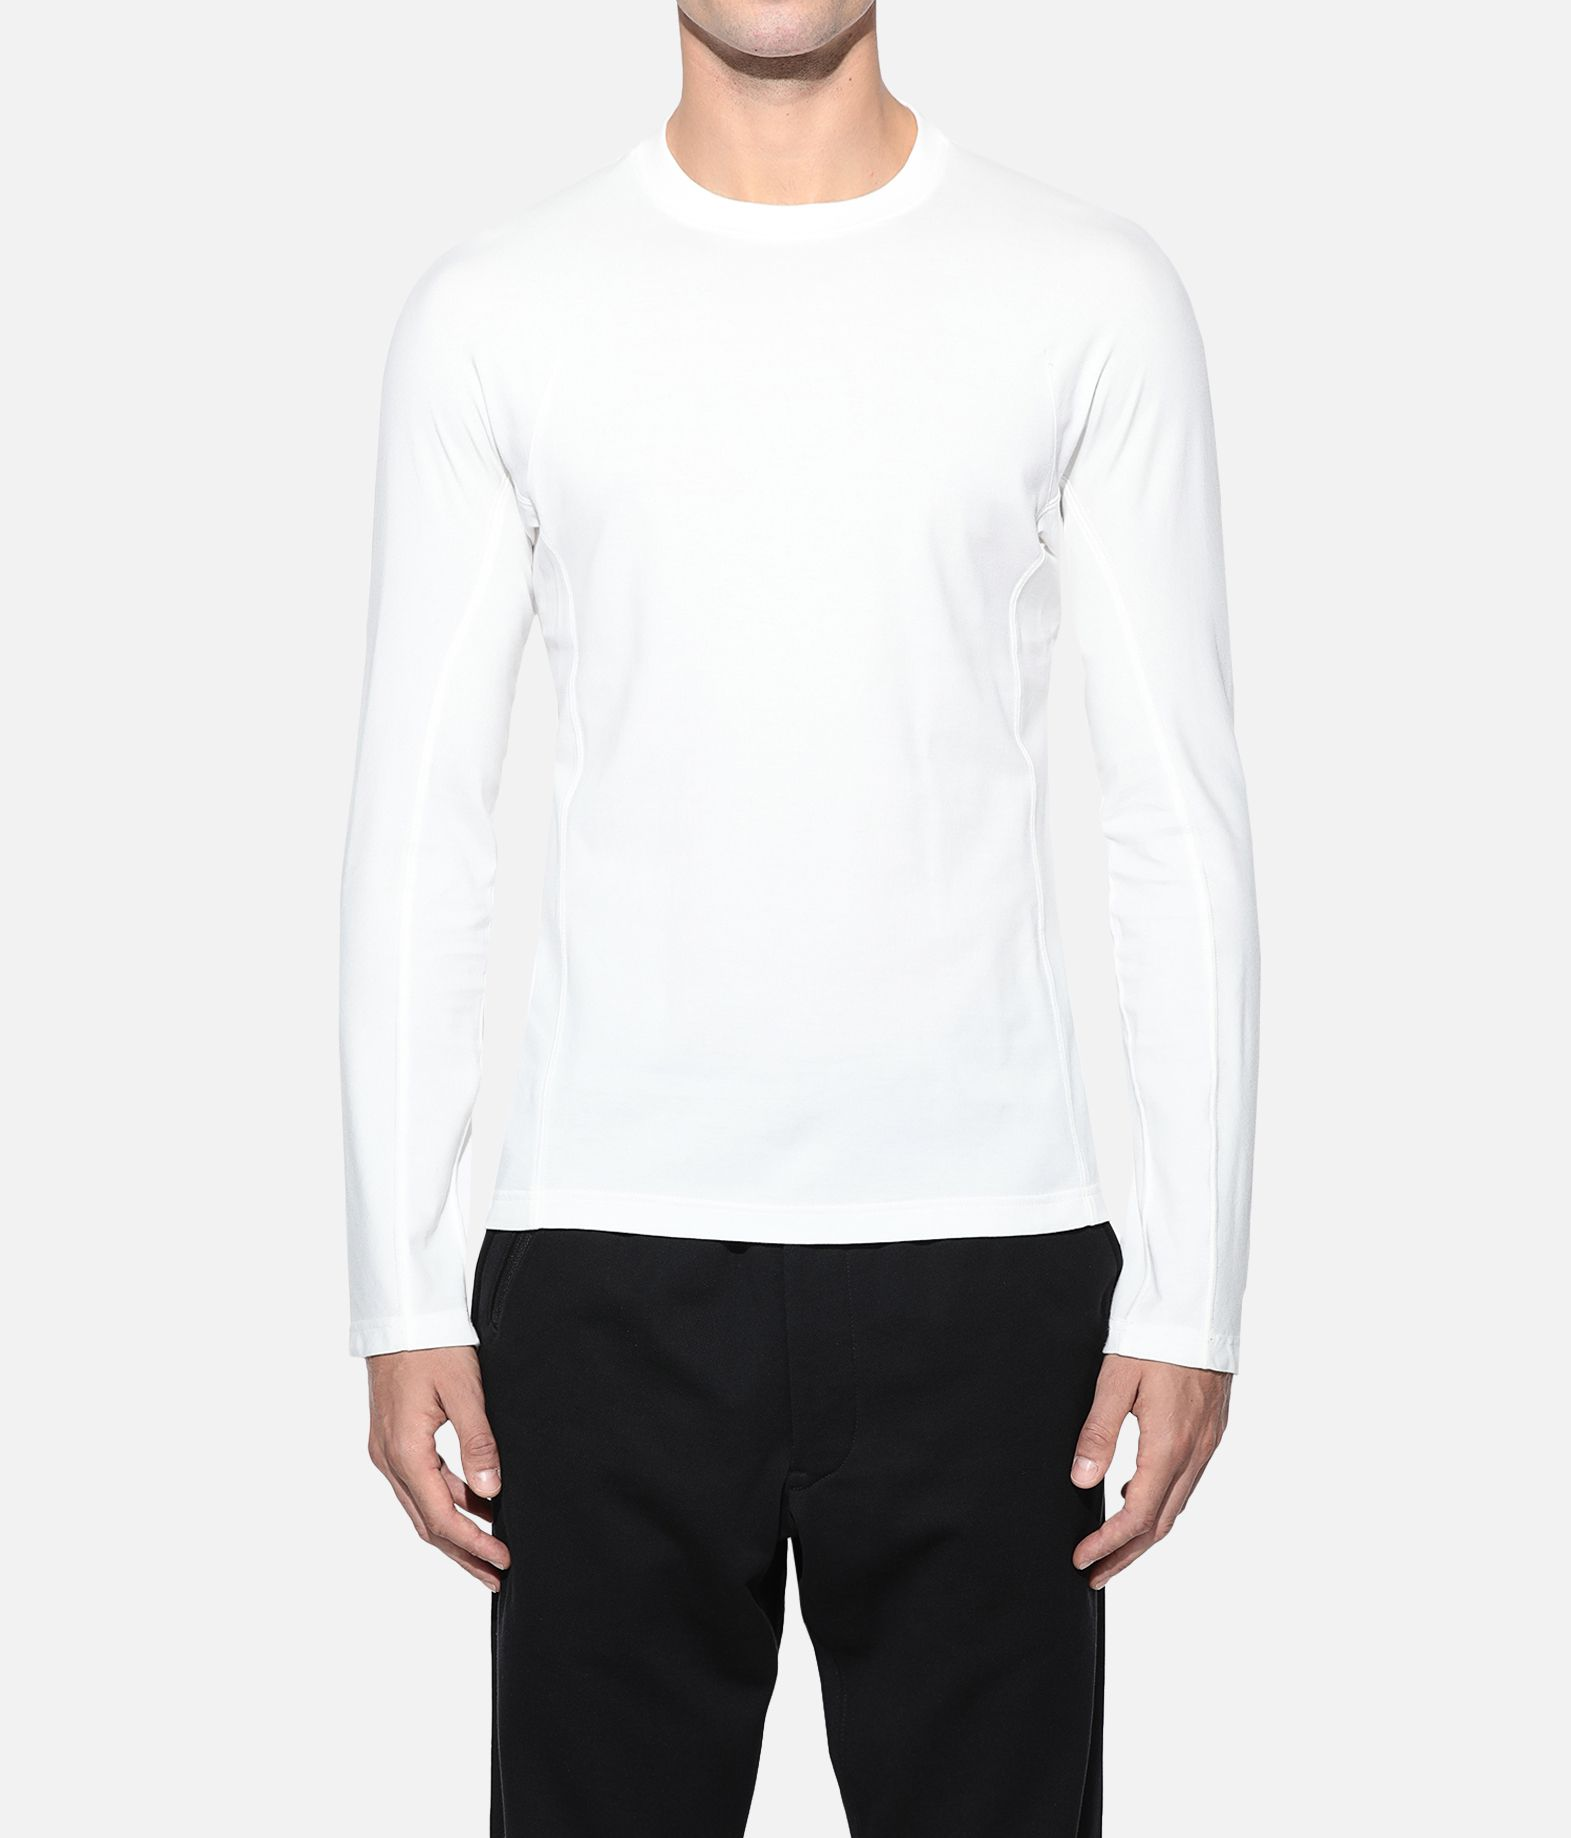 Y-3 Y-3 Classic Tee T-shirt maniche lunghe Uomo r